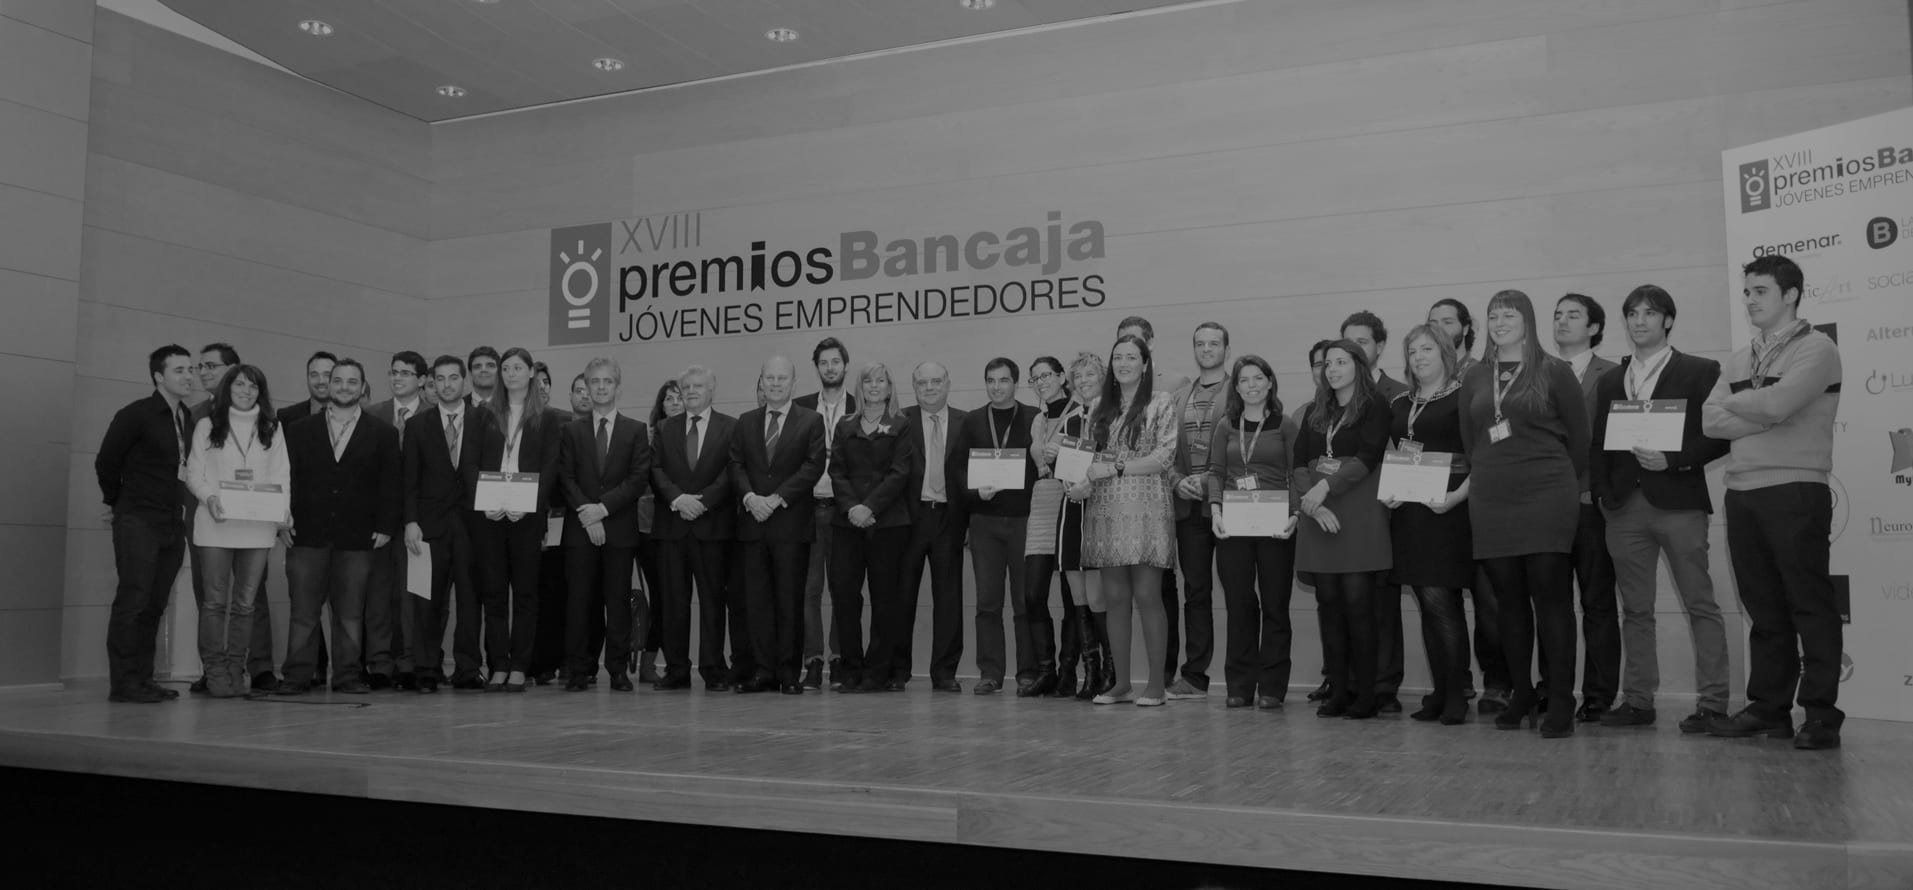 Foto-Entrega-premio-Emprendedores-Bancaja